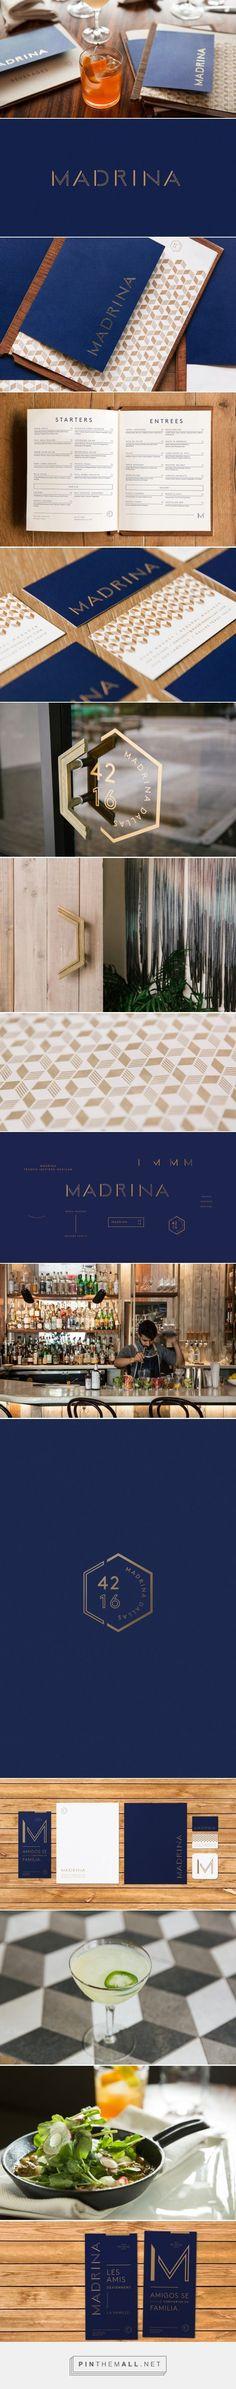 Madrina Restaurant Branding by Mast   Fivestar Branding – Design and Branding Agency & Inspiration Gallery